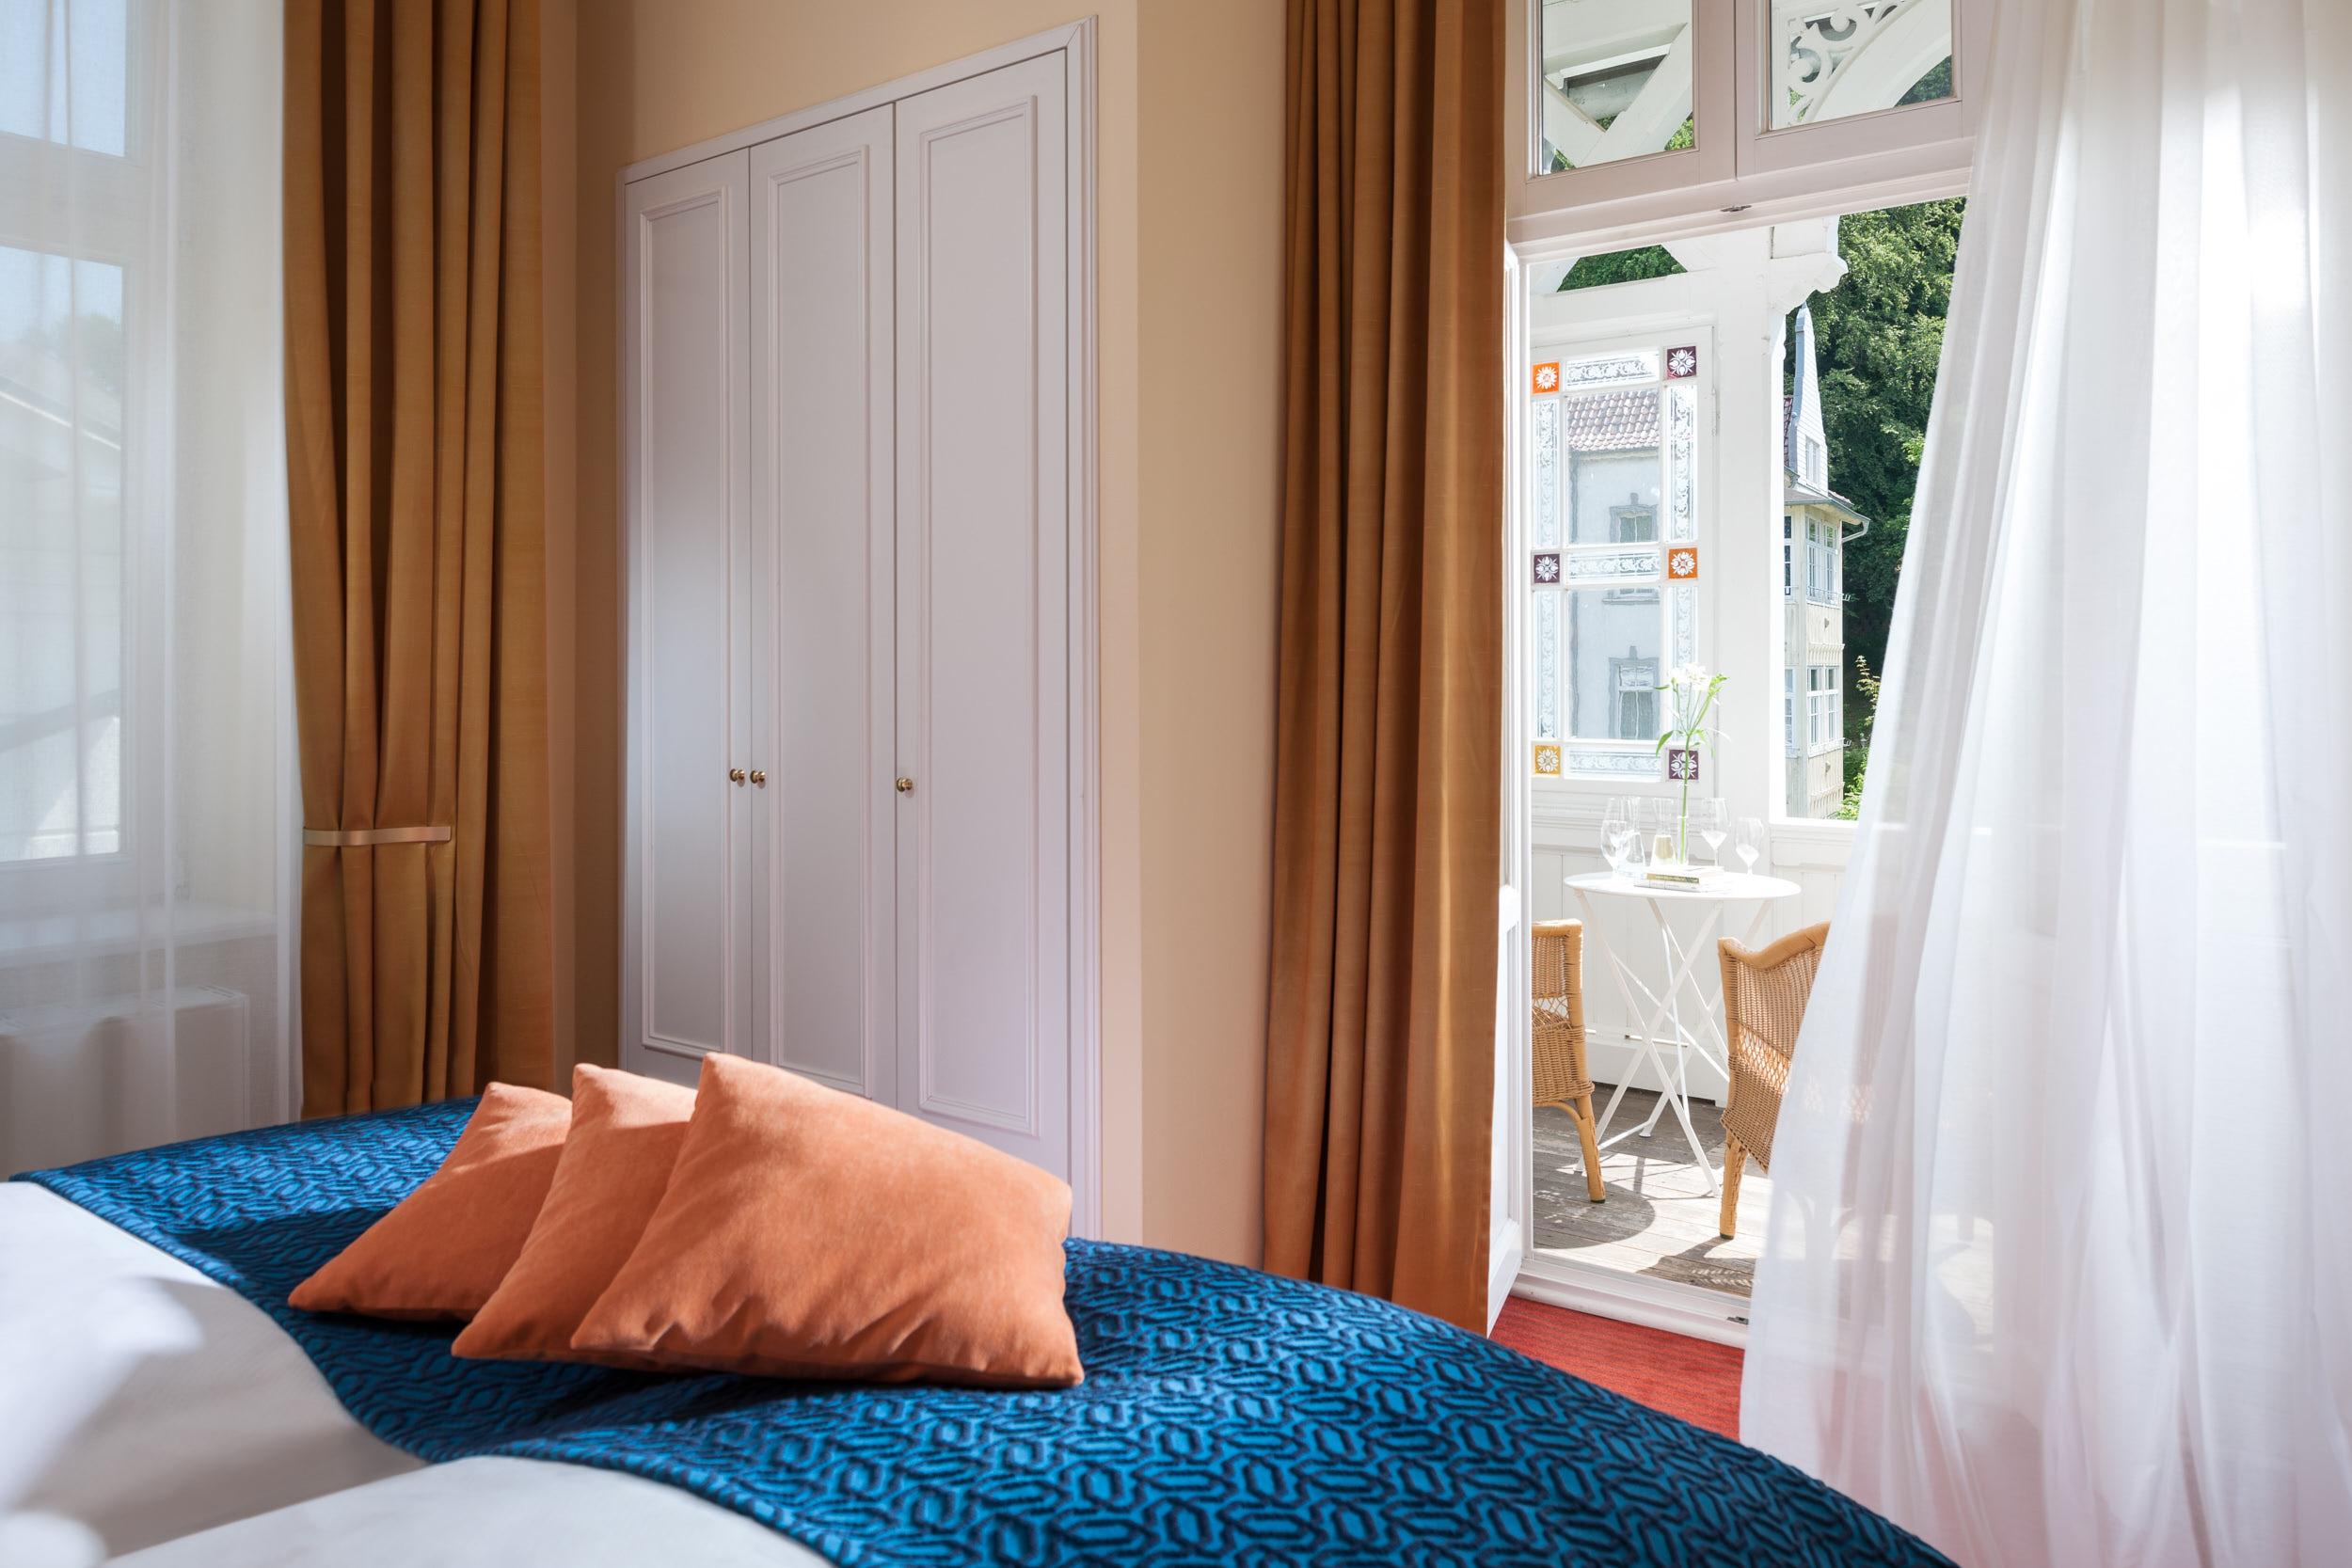 Hotelfotografie-Foto-Burwitz-Pocha 10